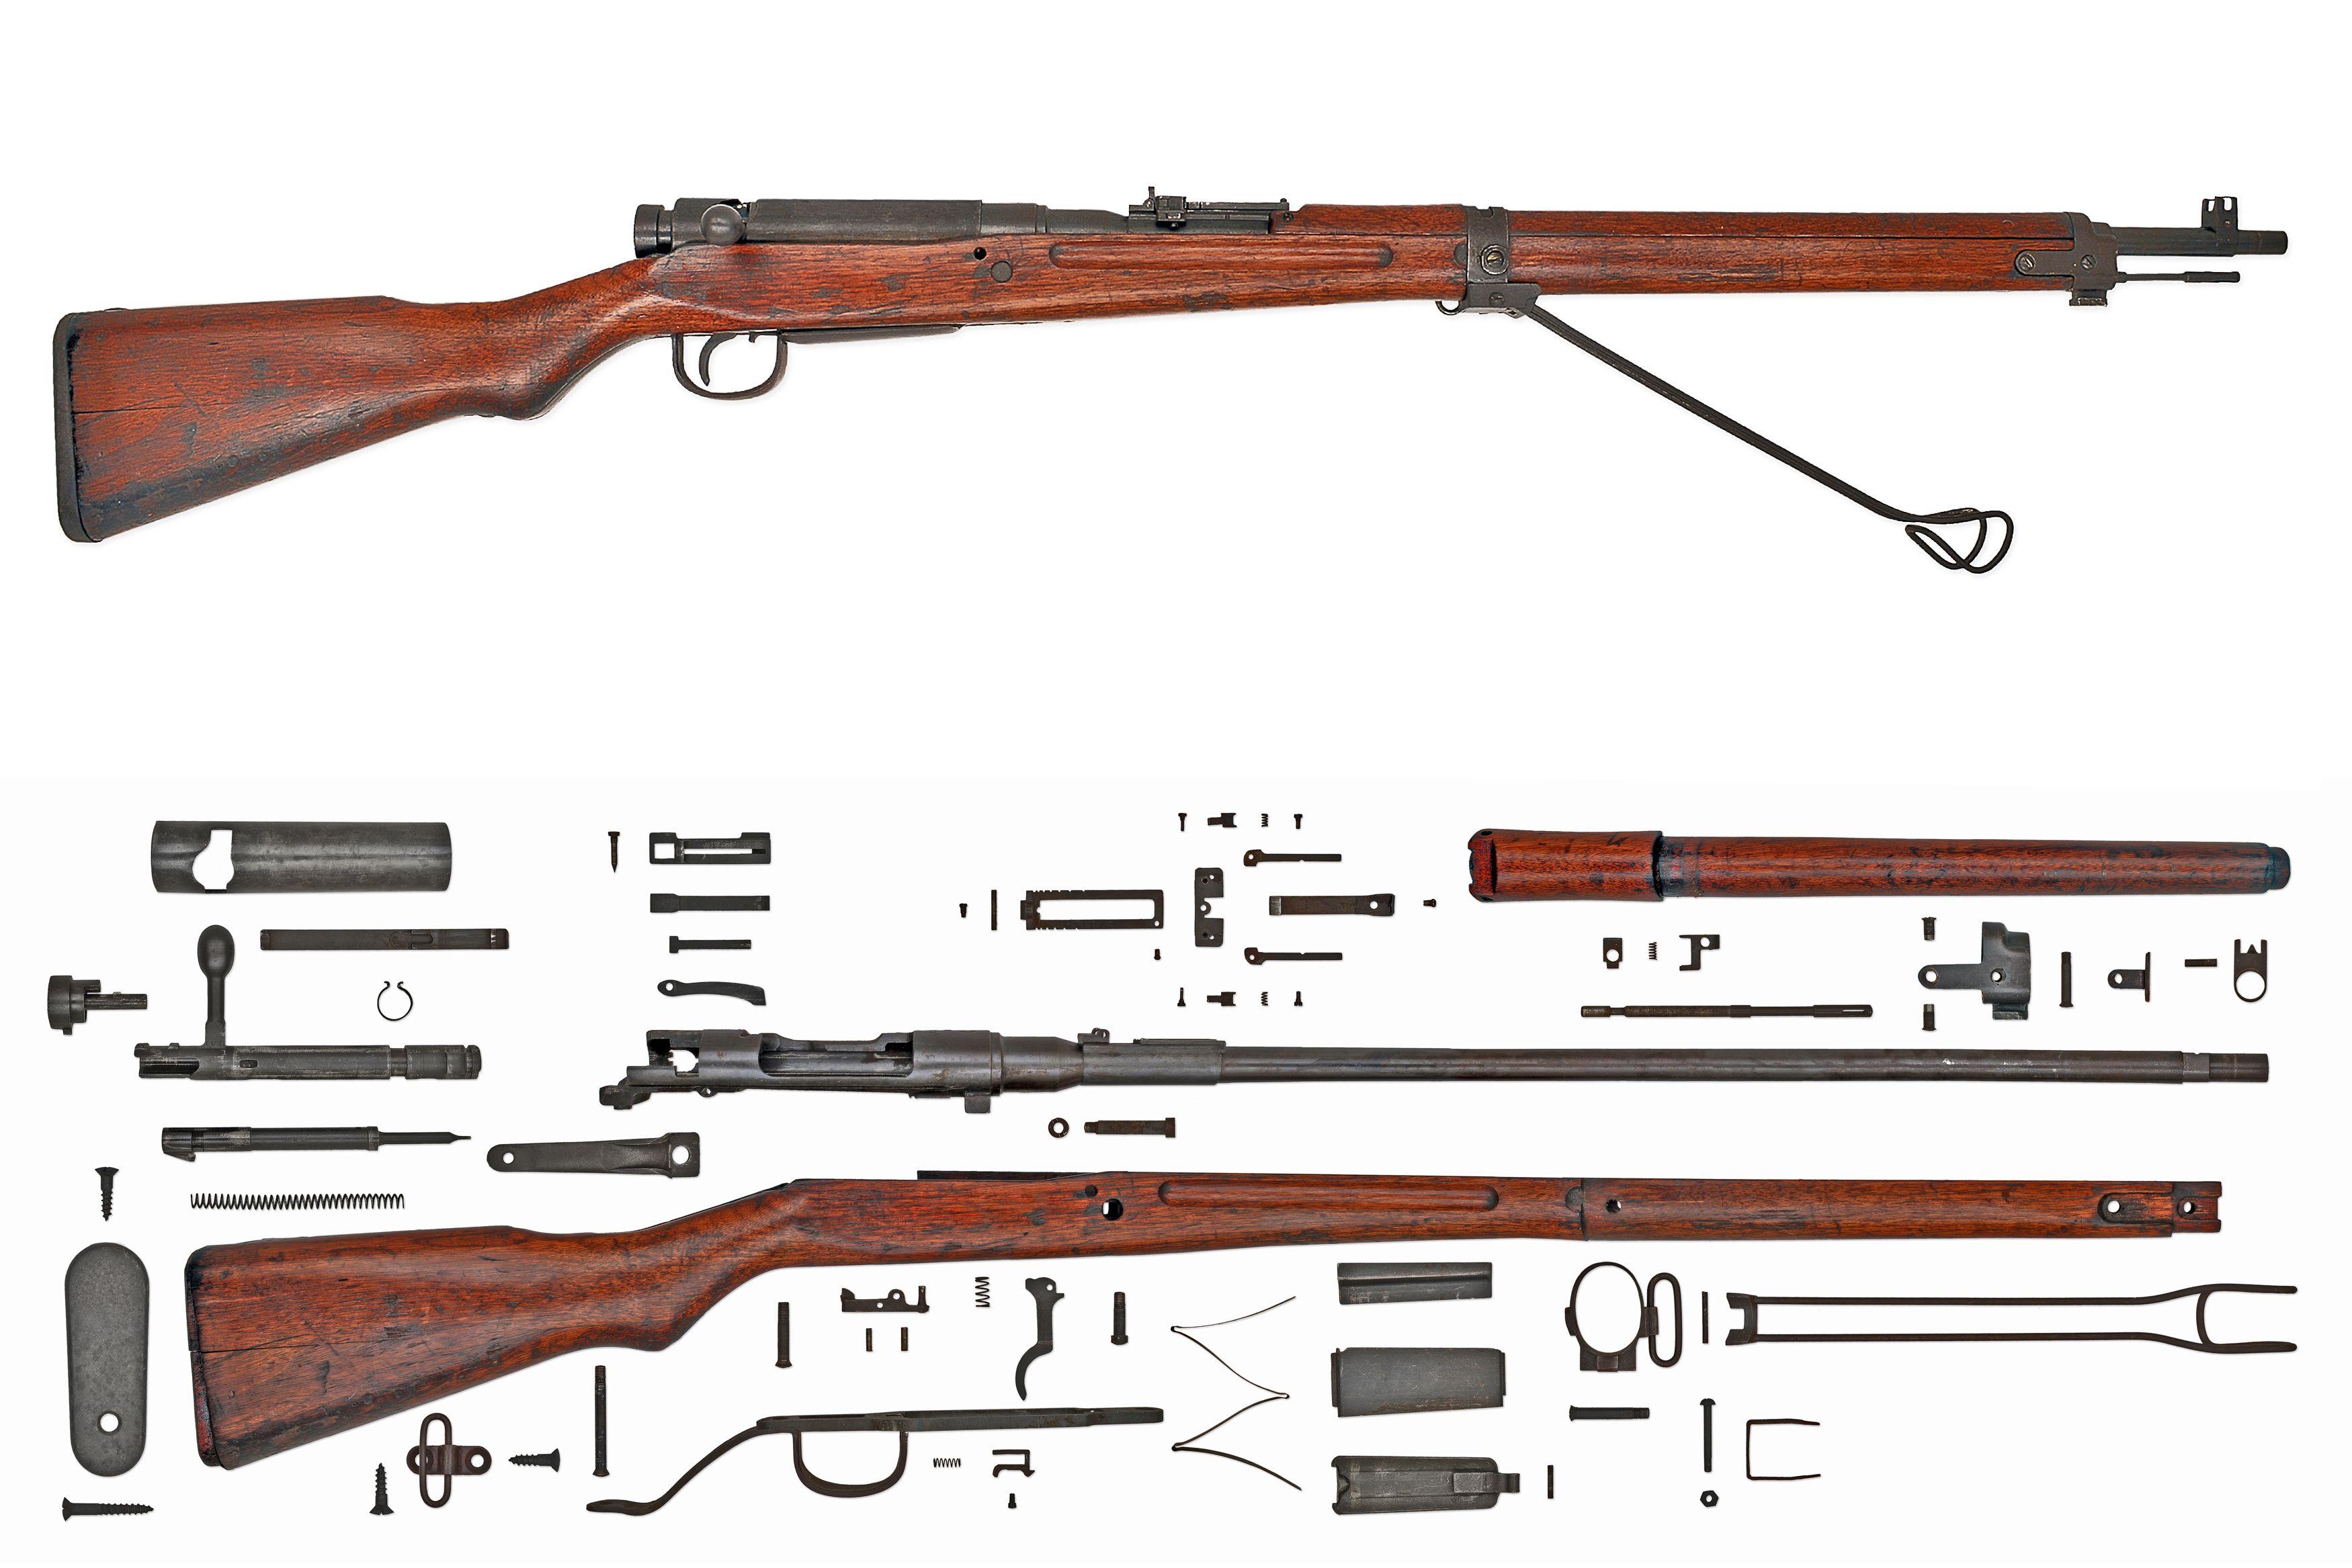 savage model 110 parts diagram ibanez wiring rg new era of anatomy rifle japanese arisaka type 99 jpg 3500 u00d72334 catalog